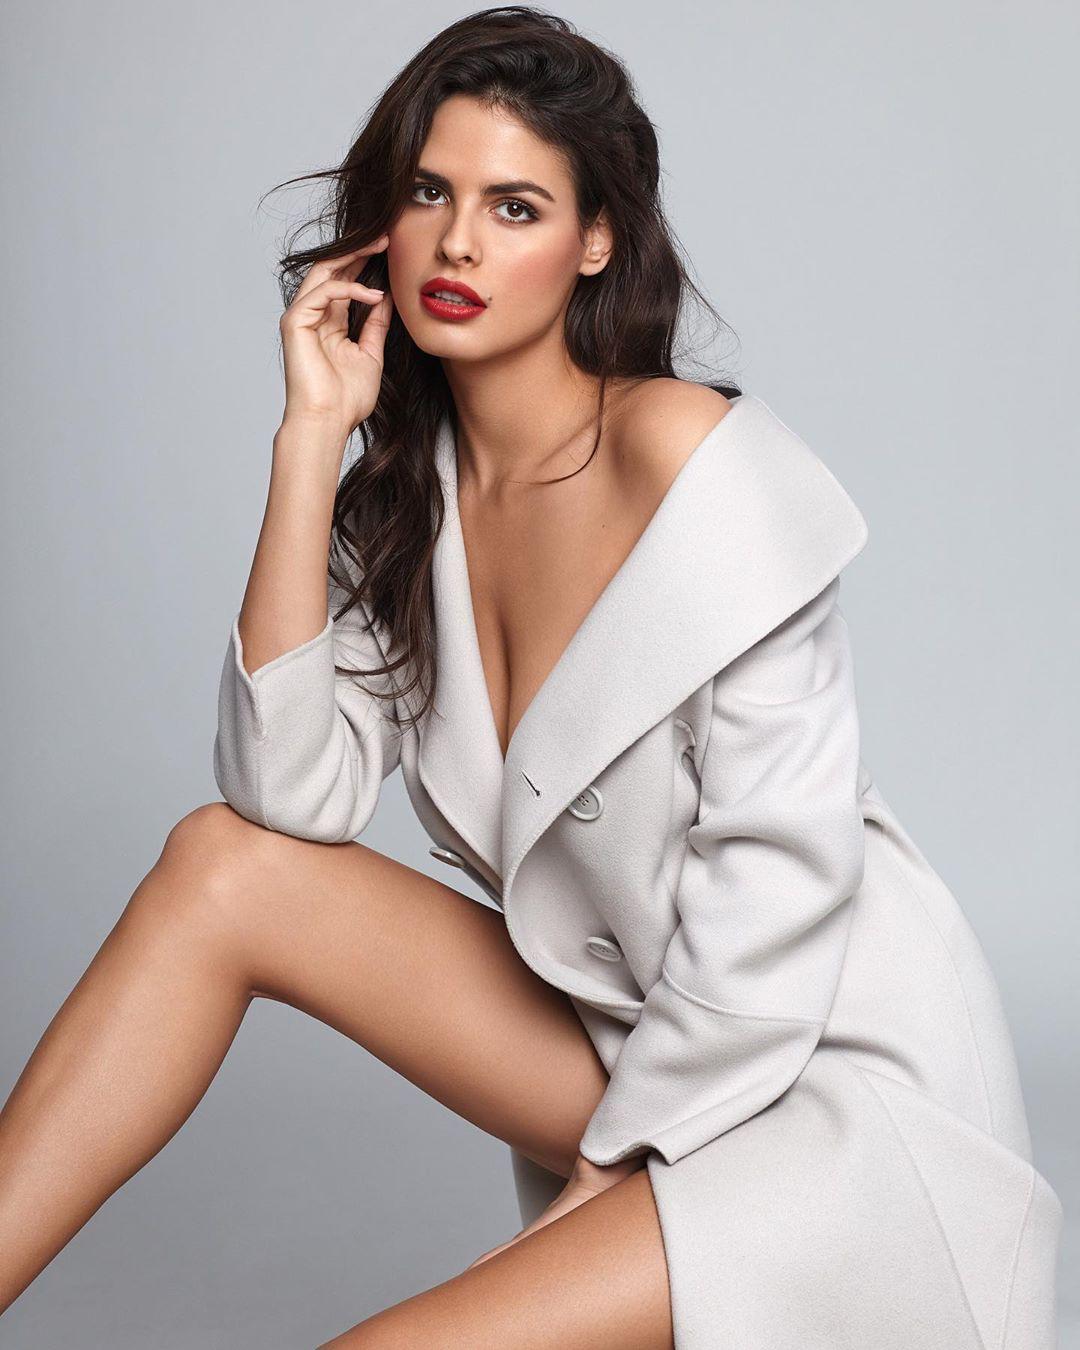 Bojana Krsmanovic girls photoshoot, hot legs girls, fine legs